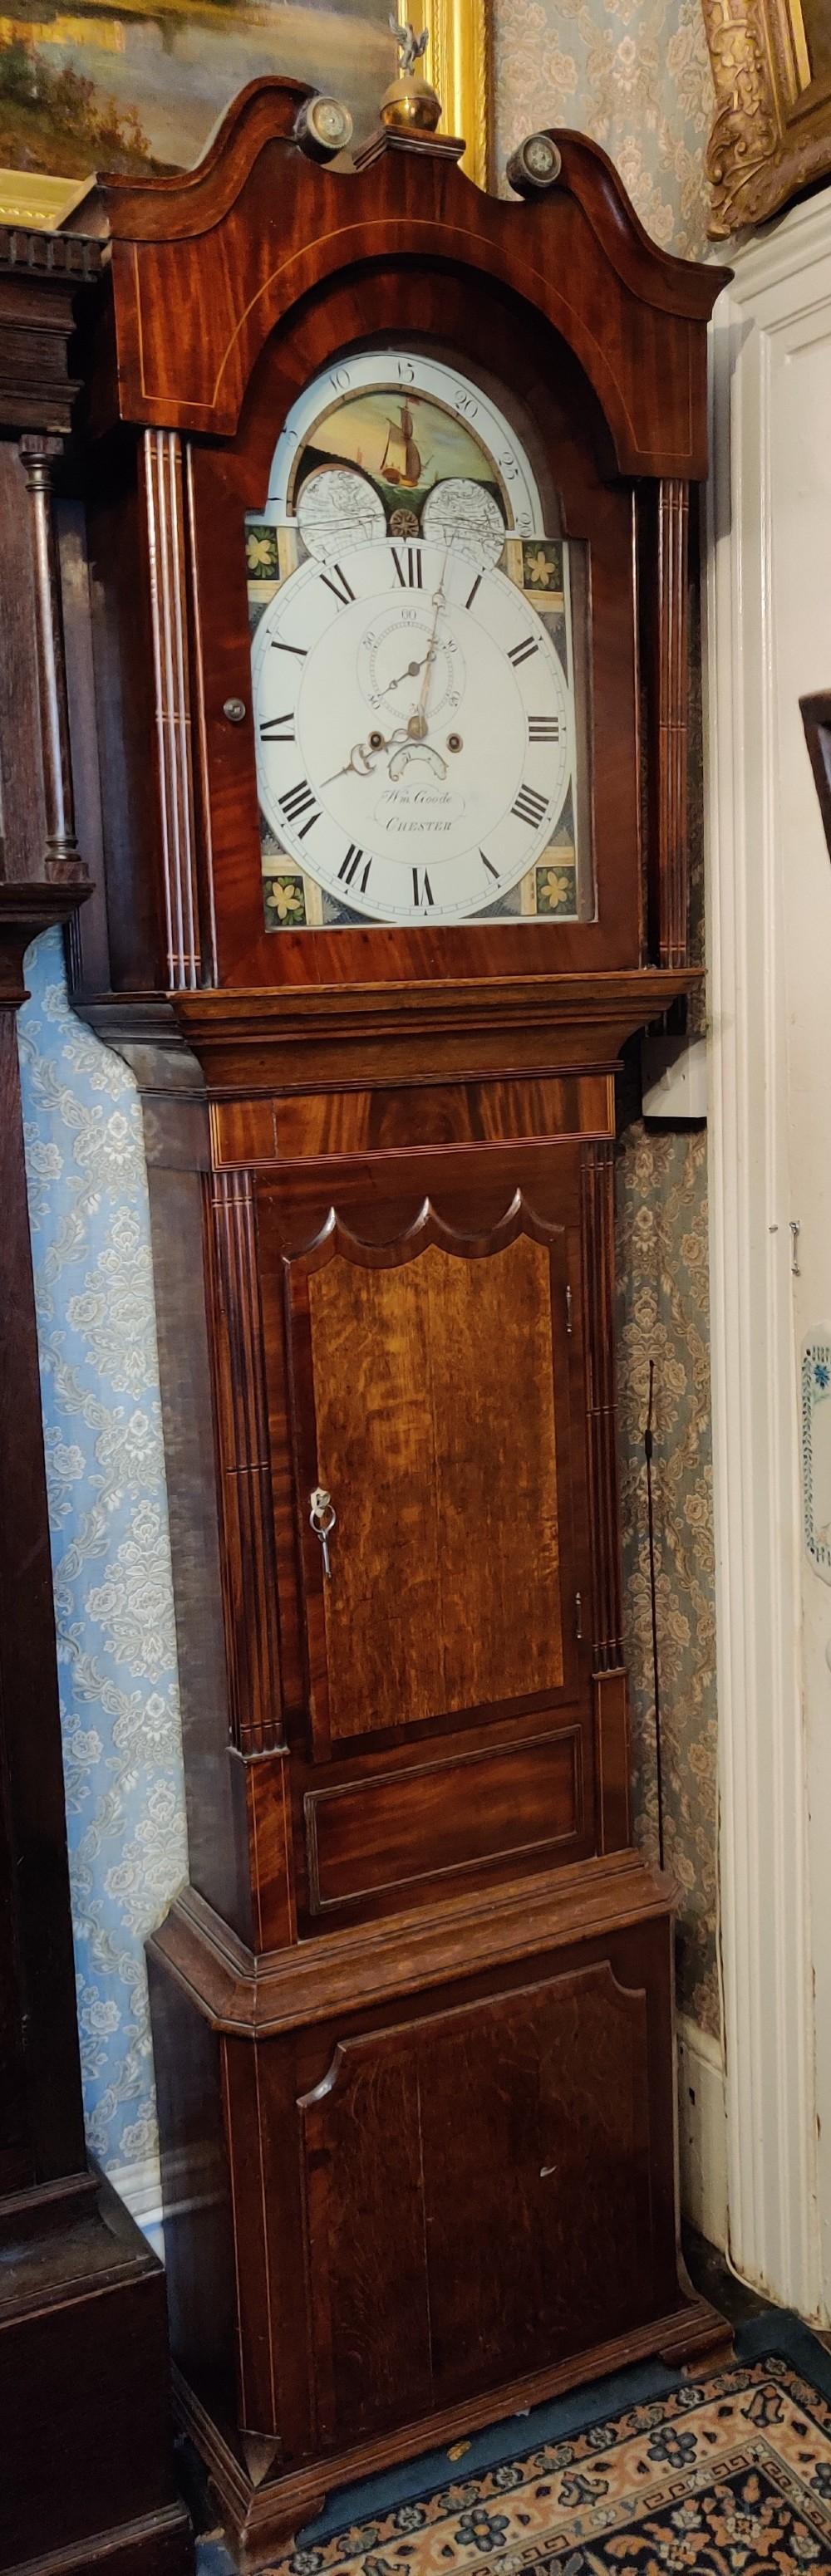 19th century english oak longcase clock